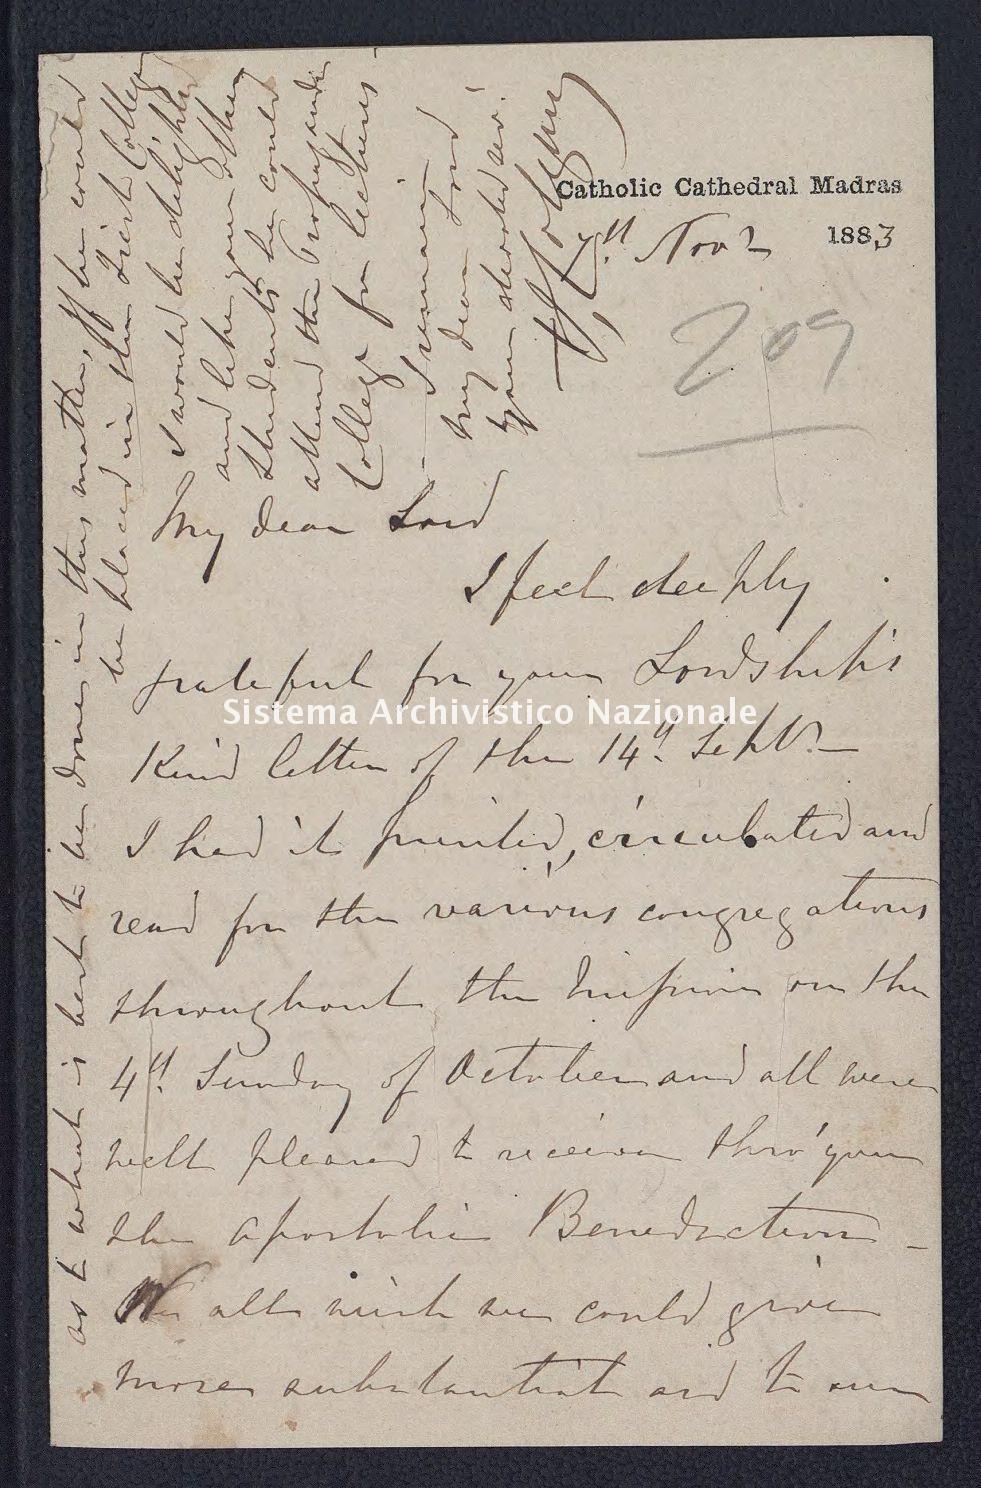 Pontificio Collegio Irlandese - Kirby_1883_209